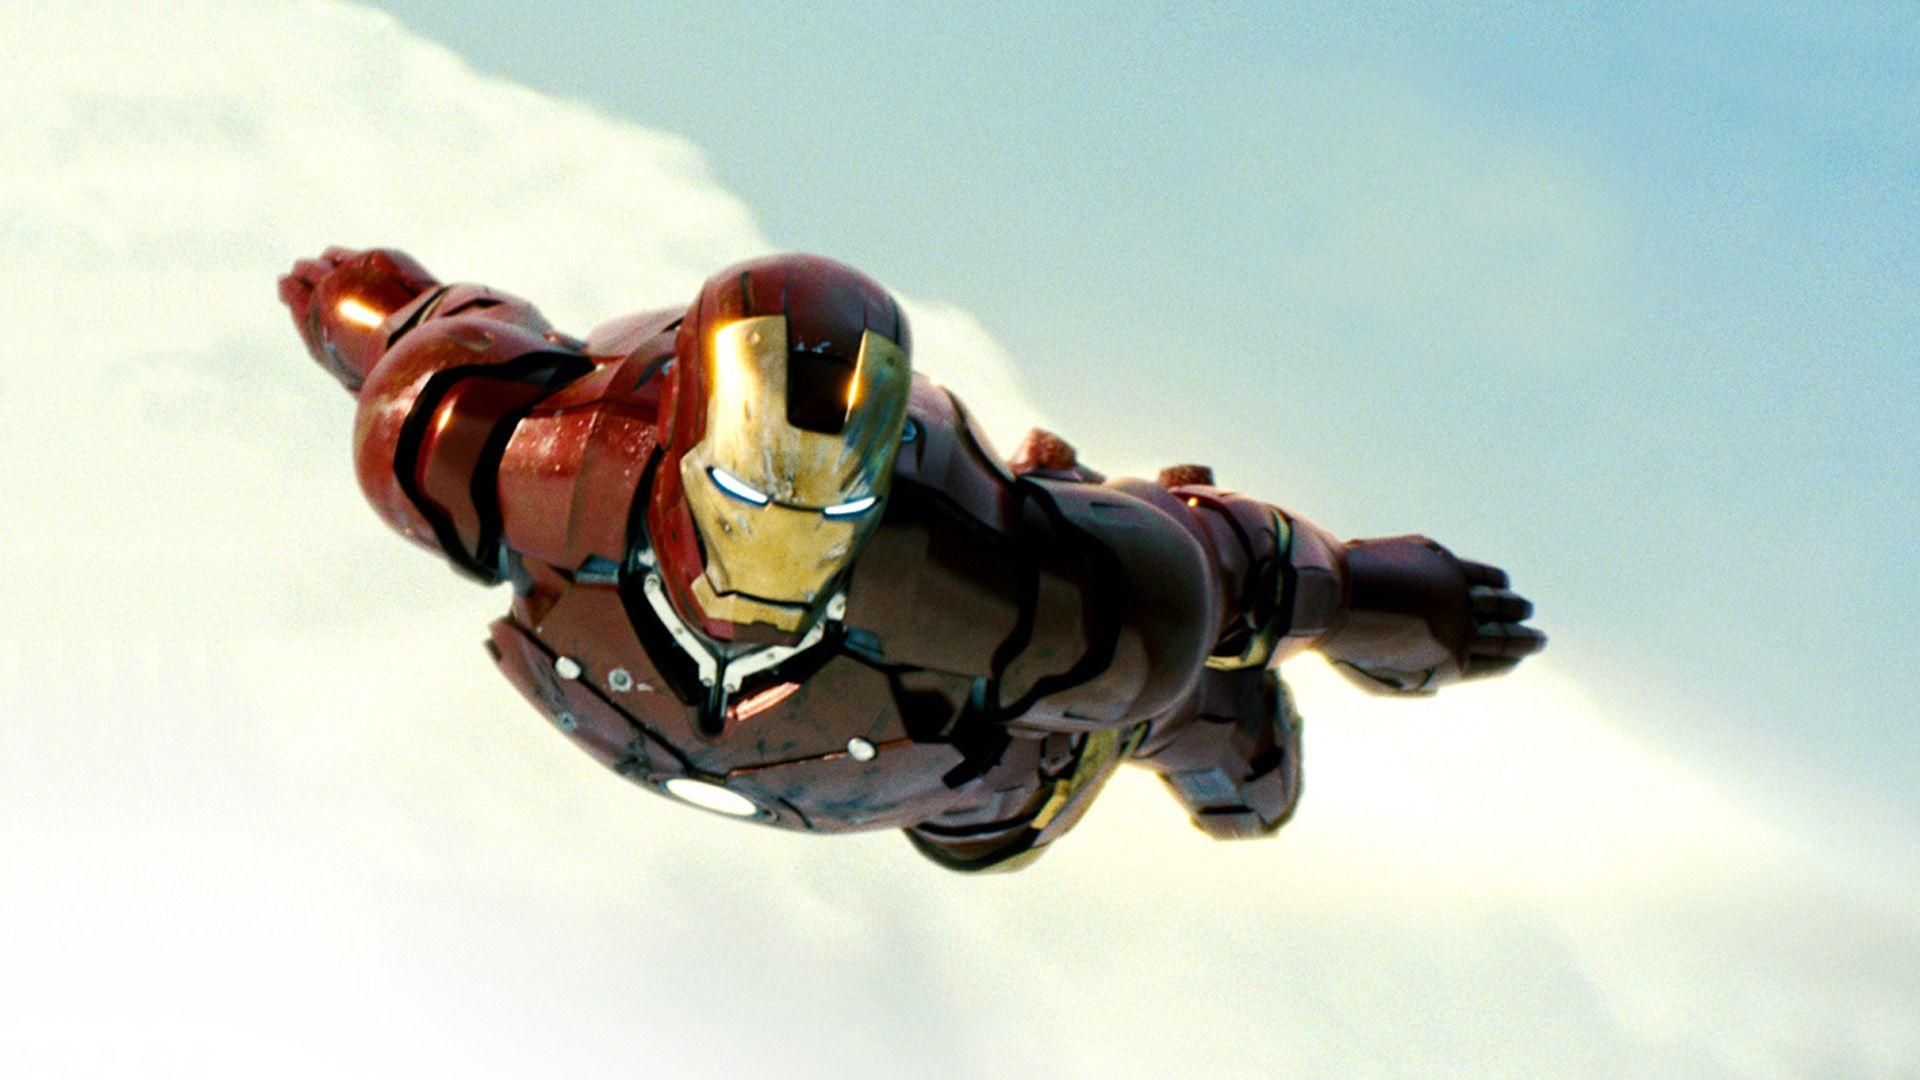 Iron Man Movies Superheroes Armor Marvel Comics Flight Iron Man 2